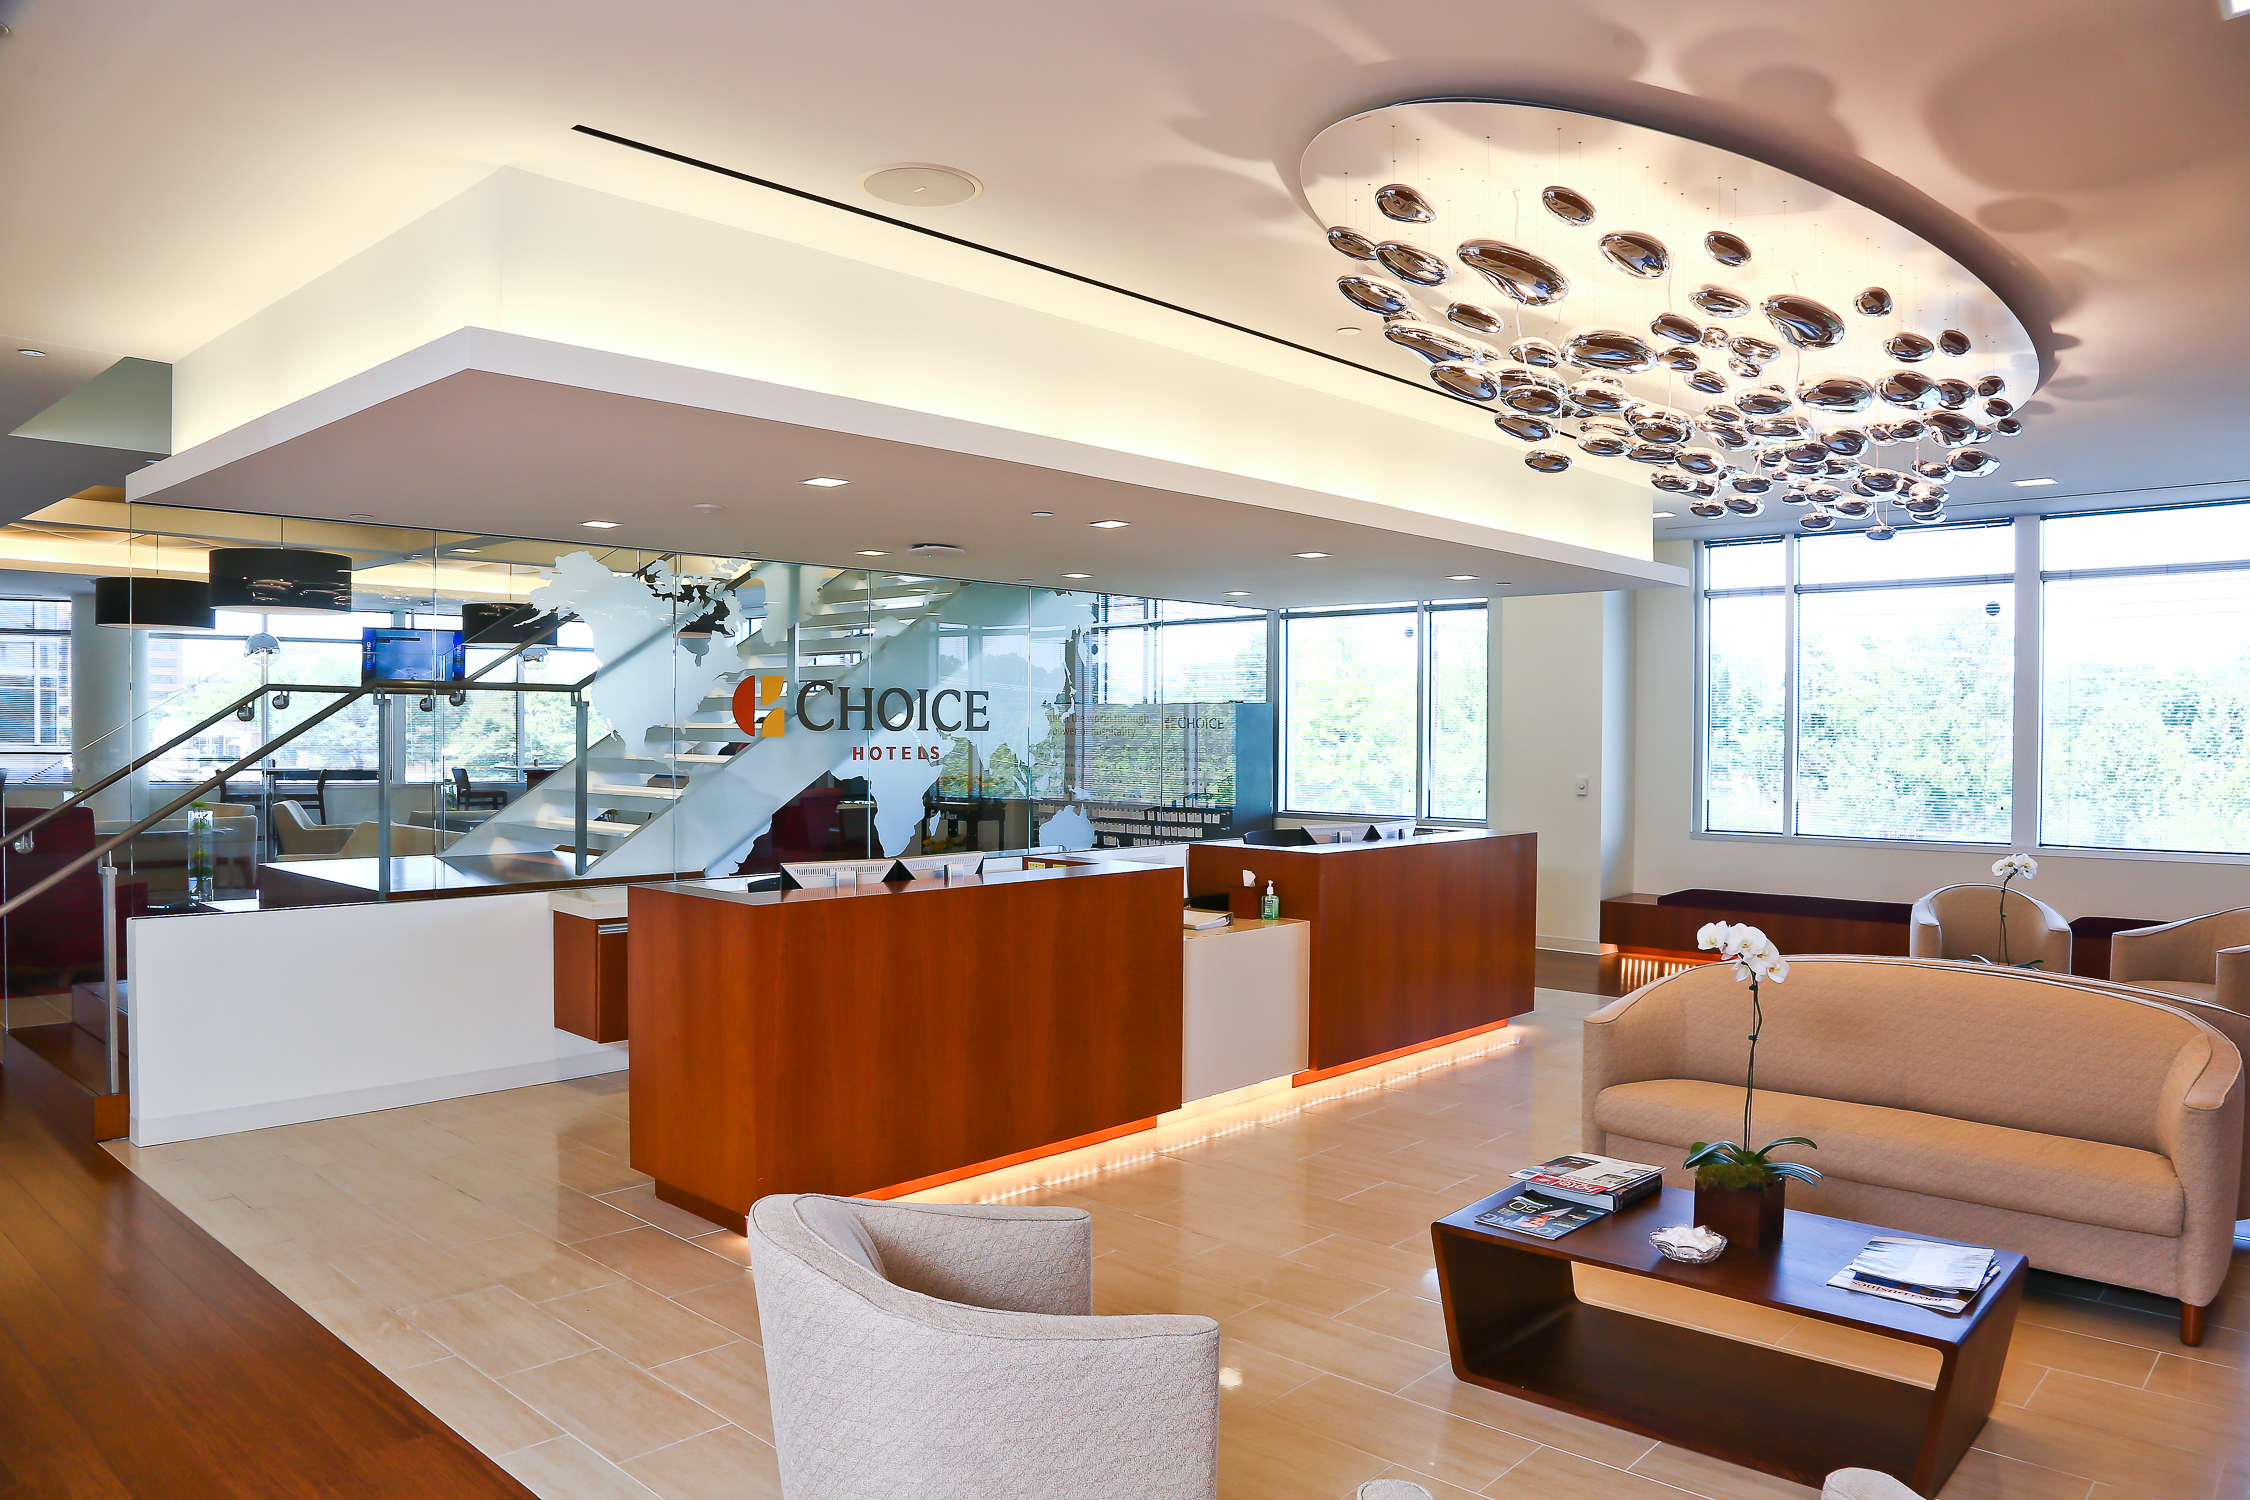 Choice hotels international media center home media center for Choice home